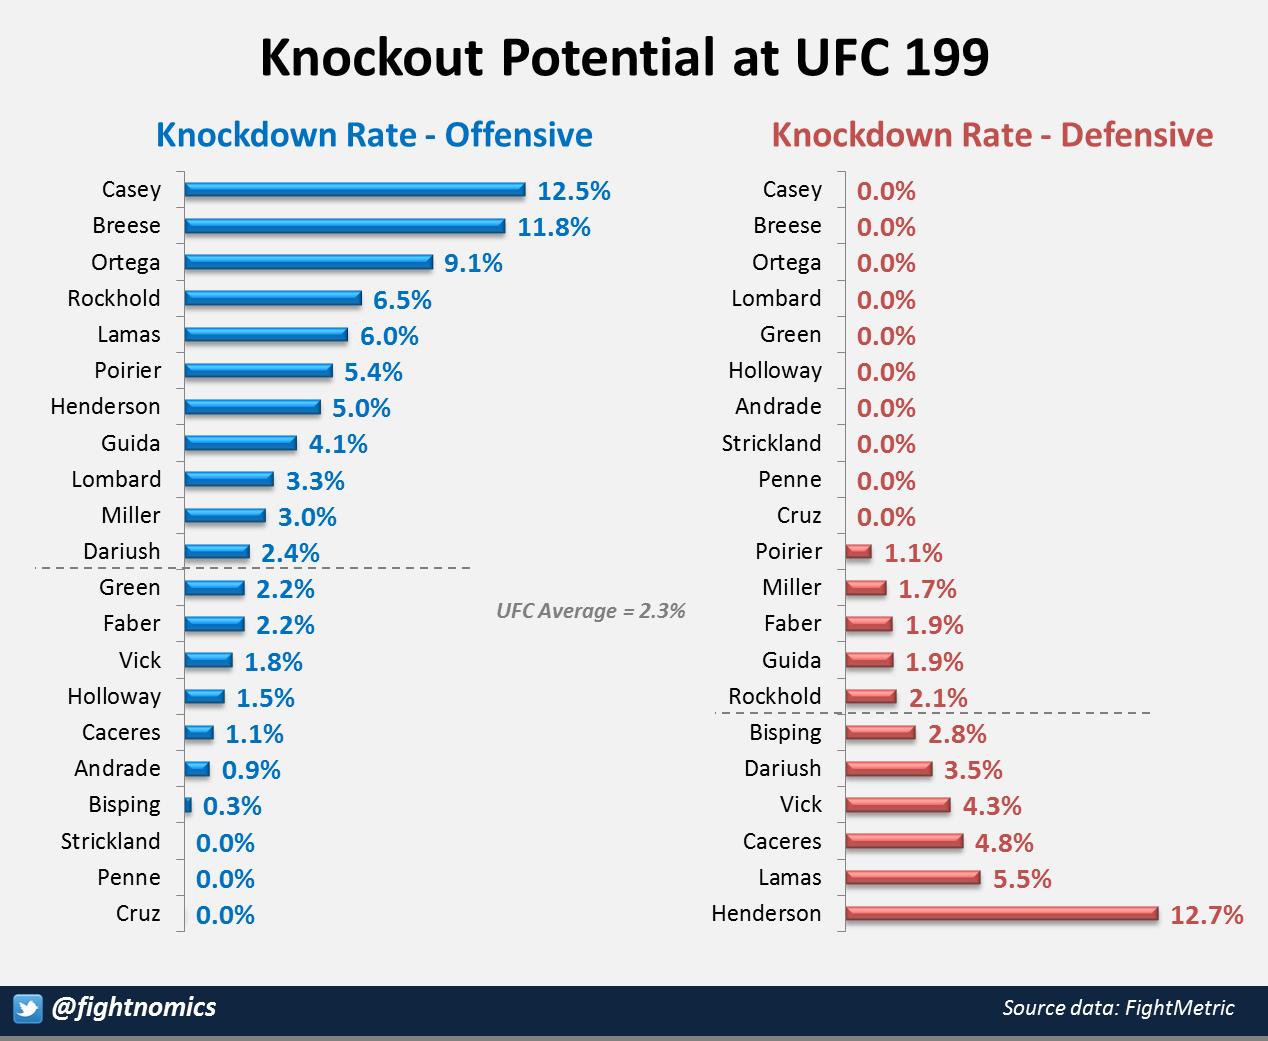 UFC 199 KO Potential